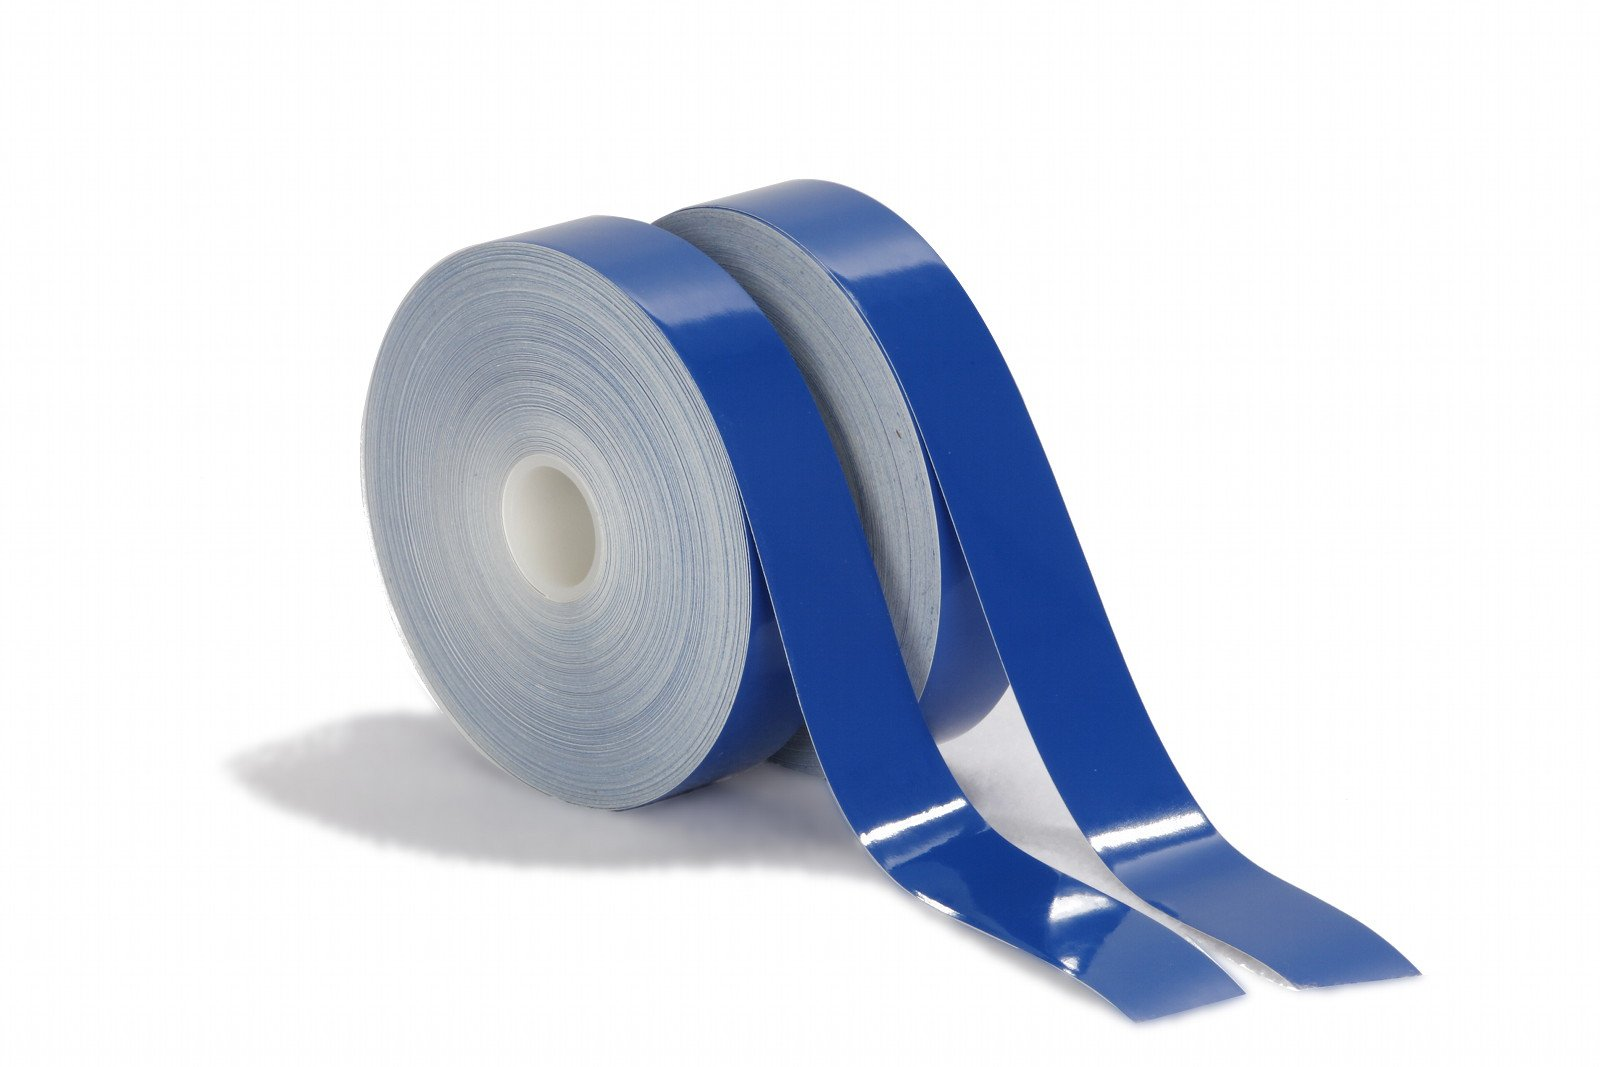 SafetyPro 1''x150', 2-pack Blue Premium Vinyl Labeling Tape